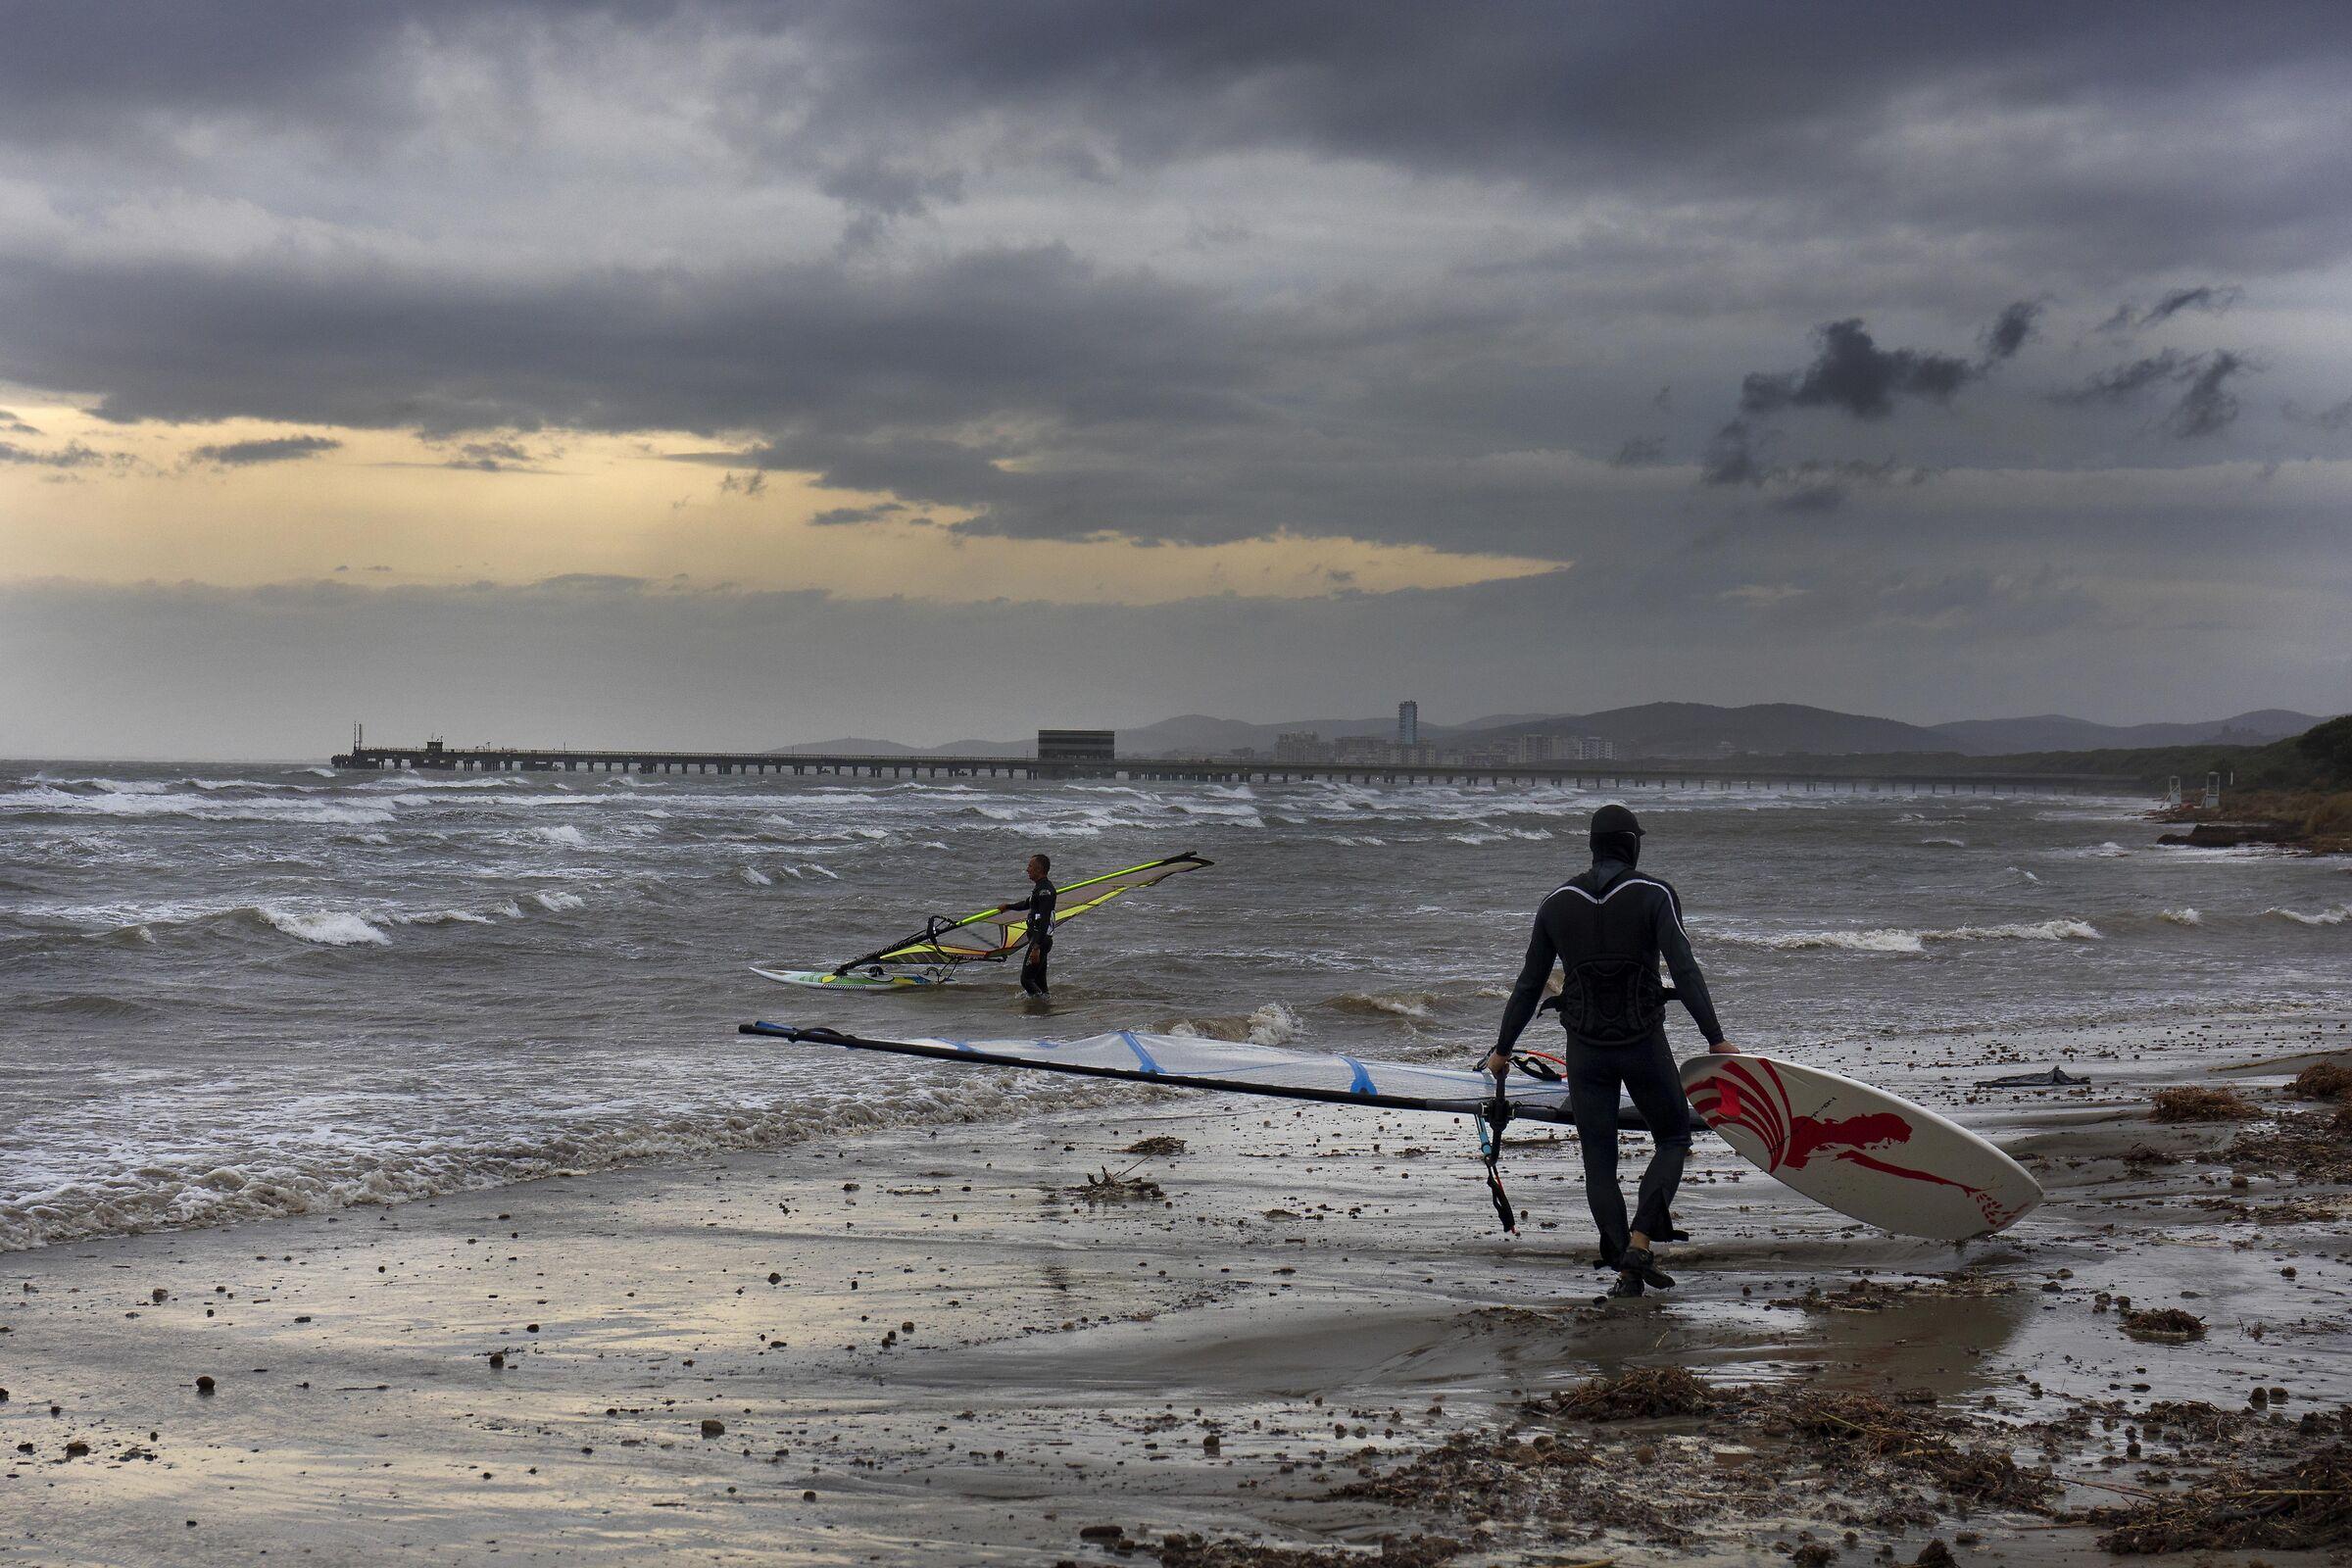 Windsurfing in the Gulf of Follonica...